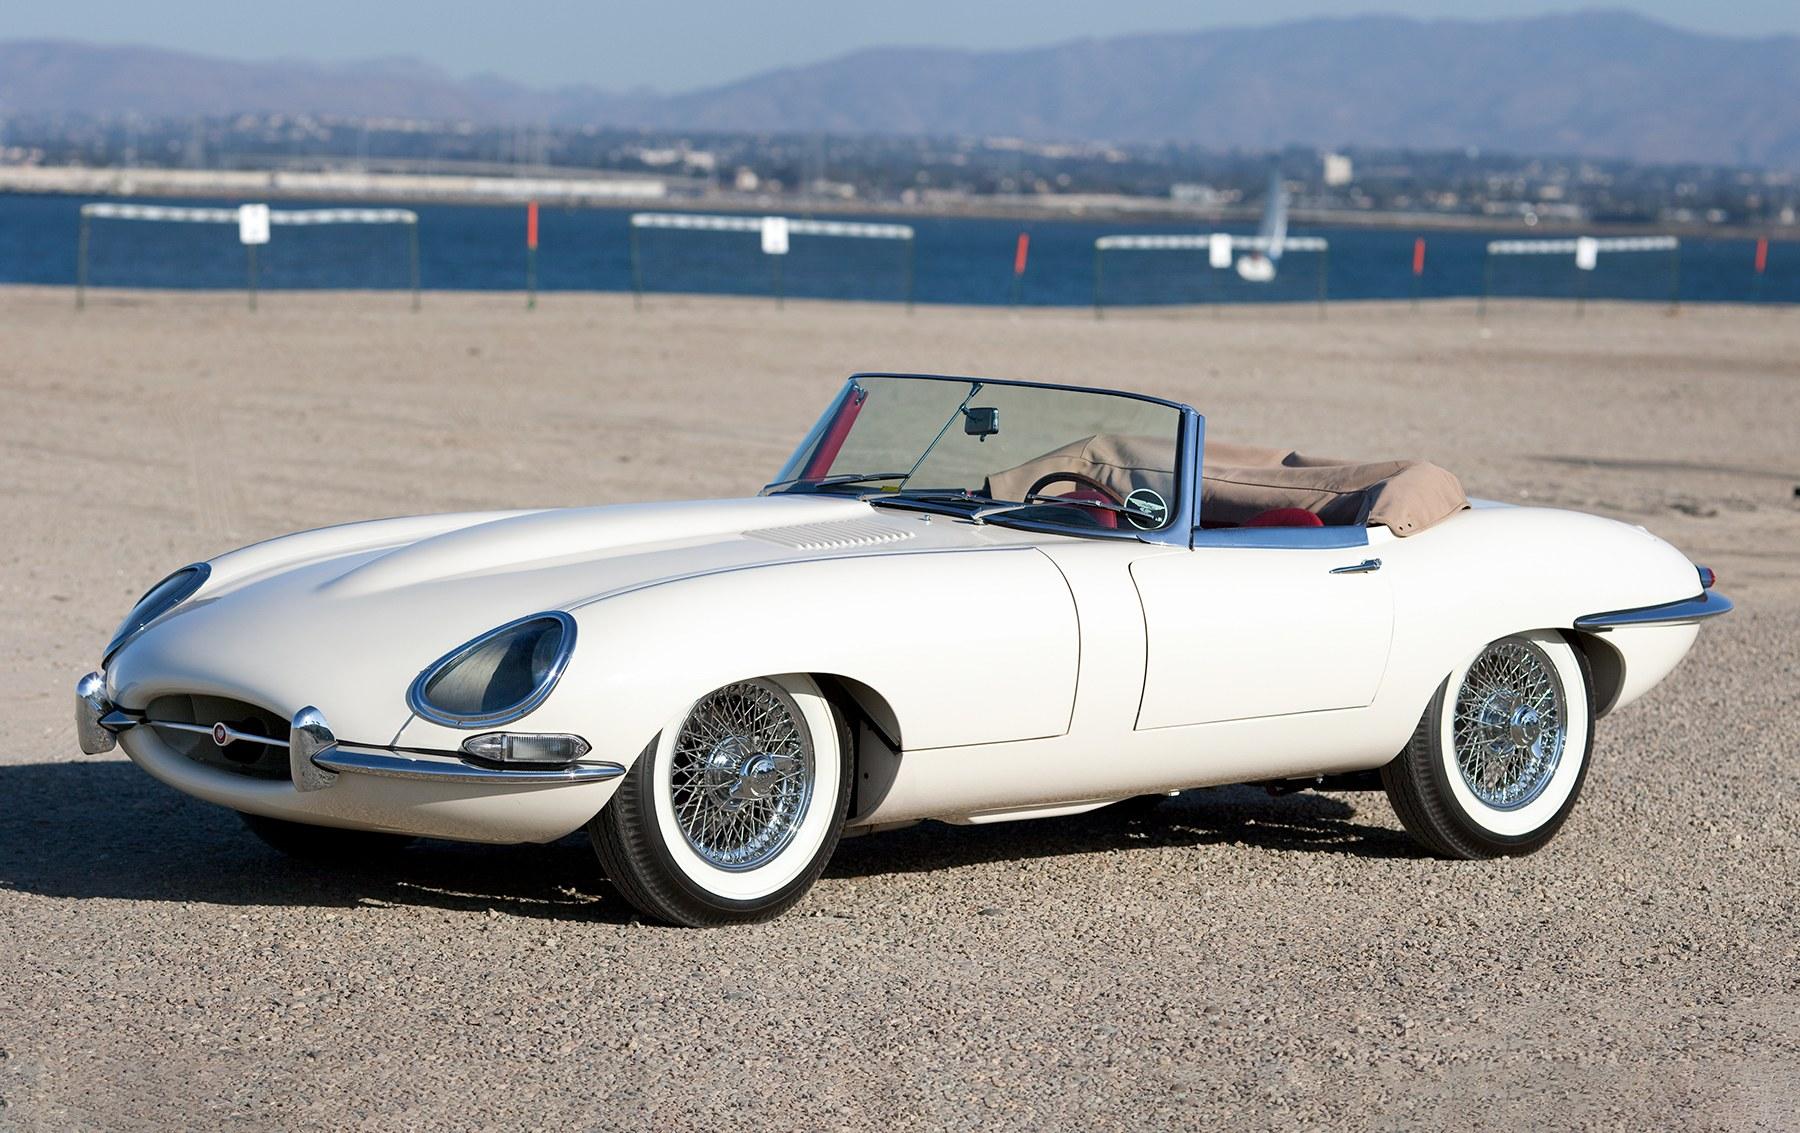 1962 Jaguar E-Type 3.8 Litre Roadster